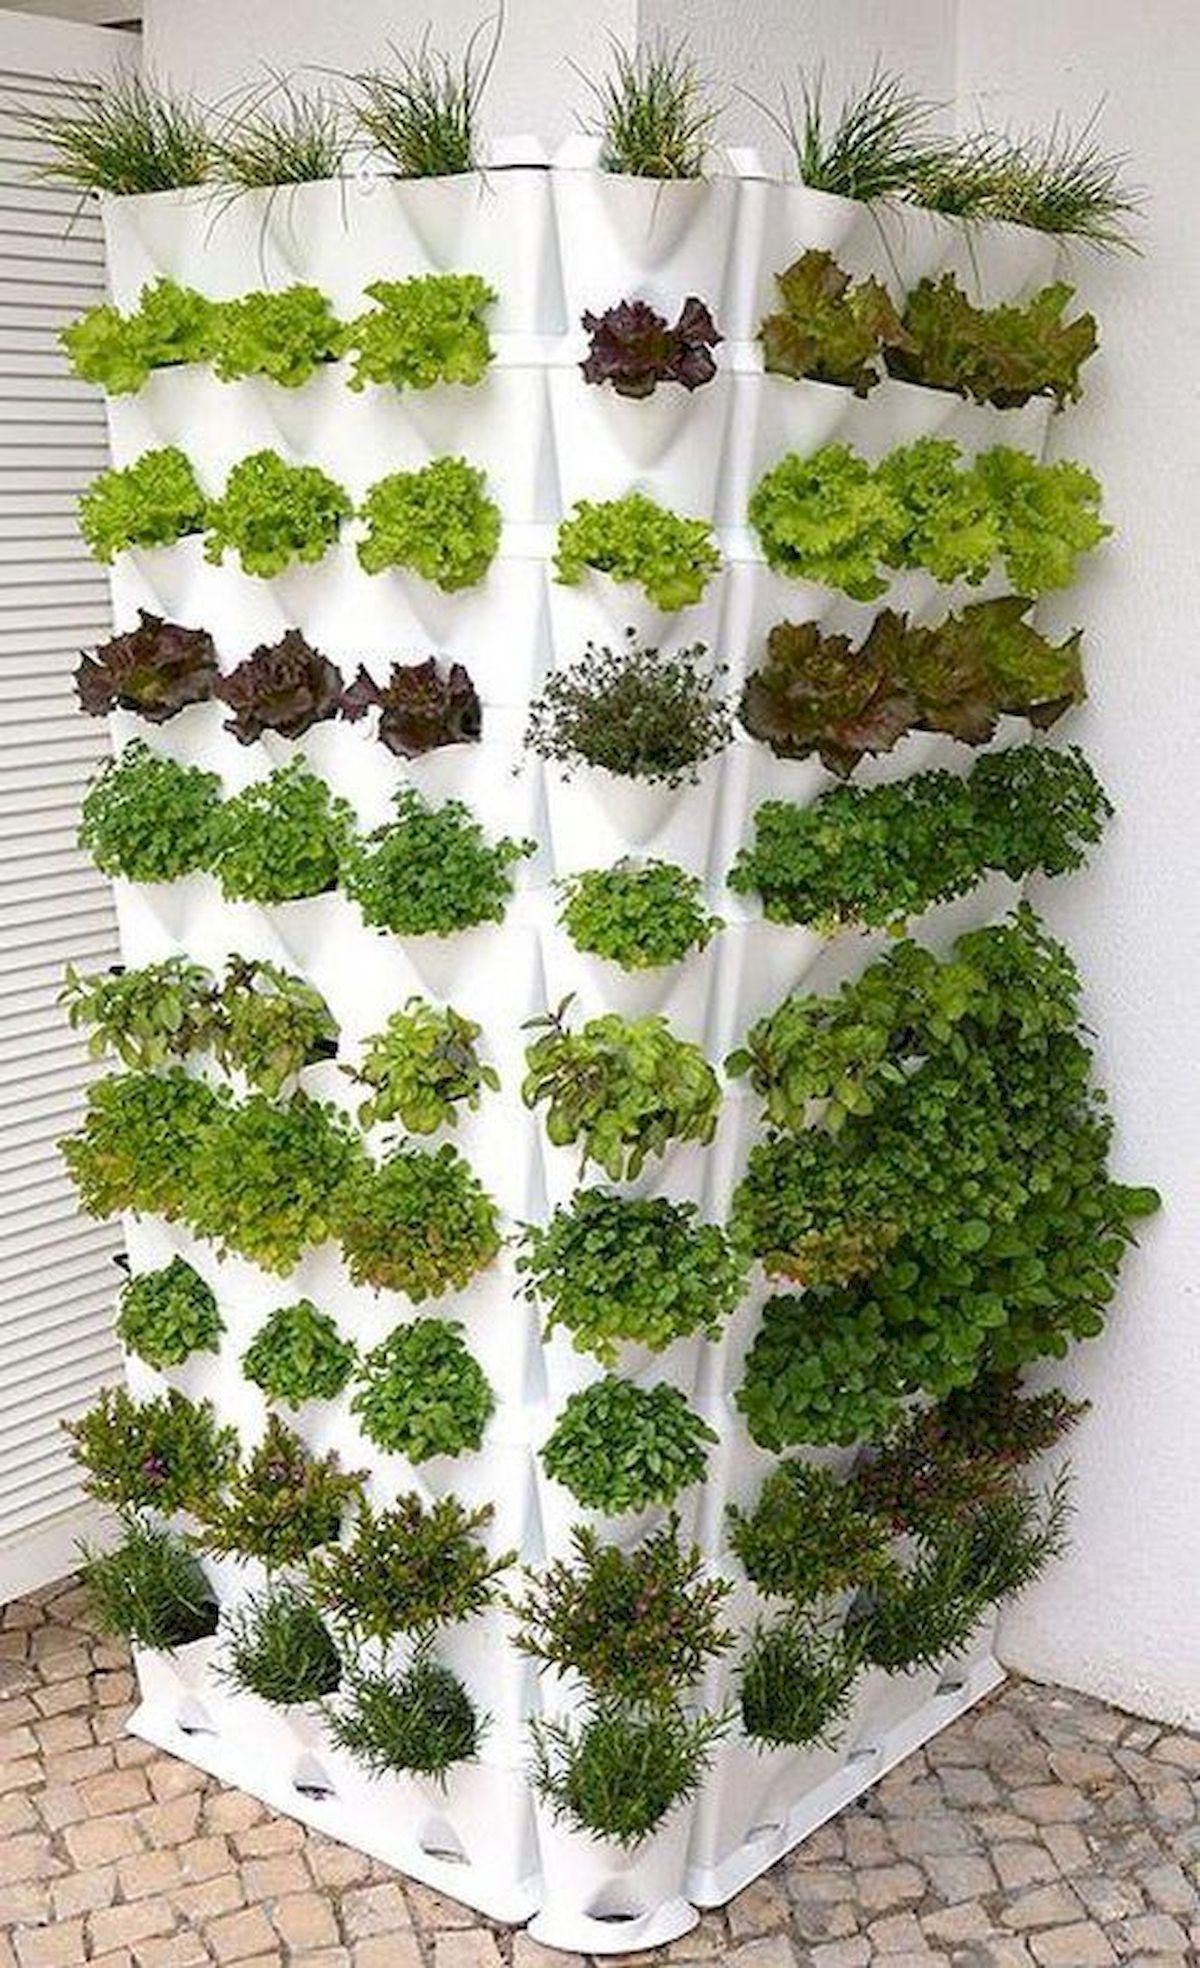 33 Best Hydroponic Gardening For Beginners Design Ideas (1 ...